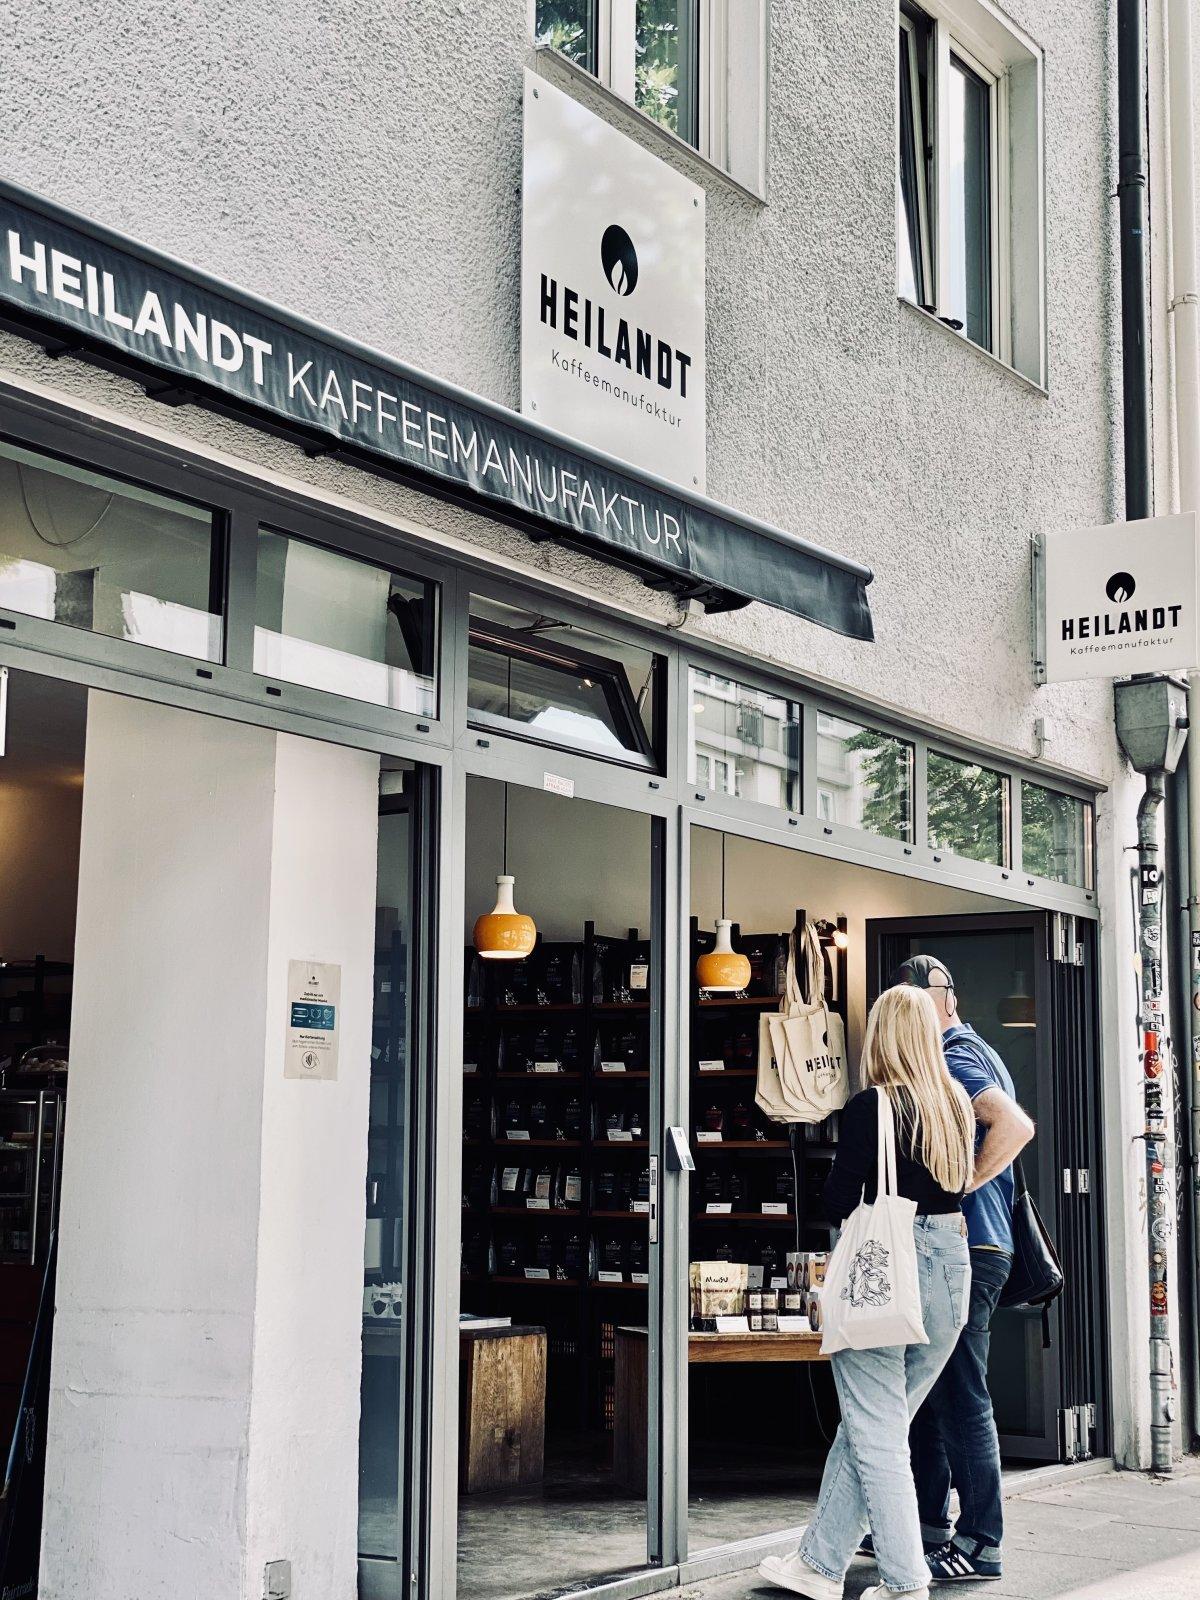 Filiale der Kaffemanufaktur Heilandt in Köln Sülz